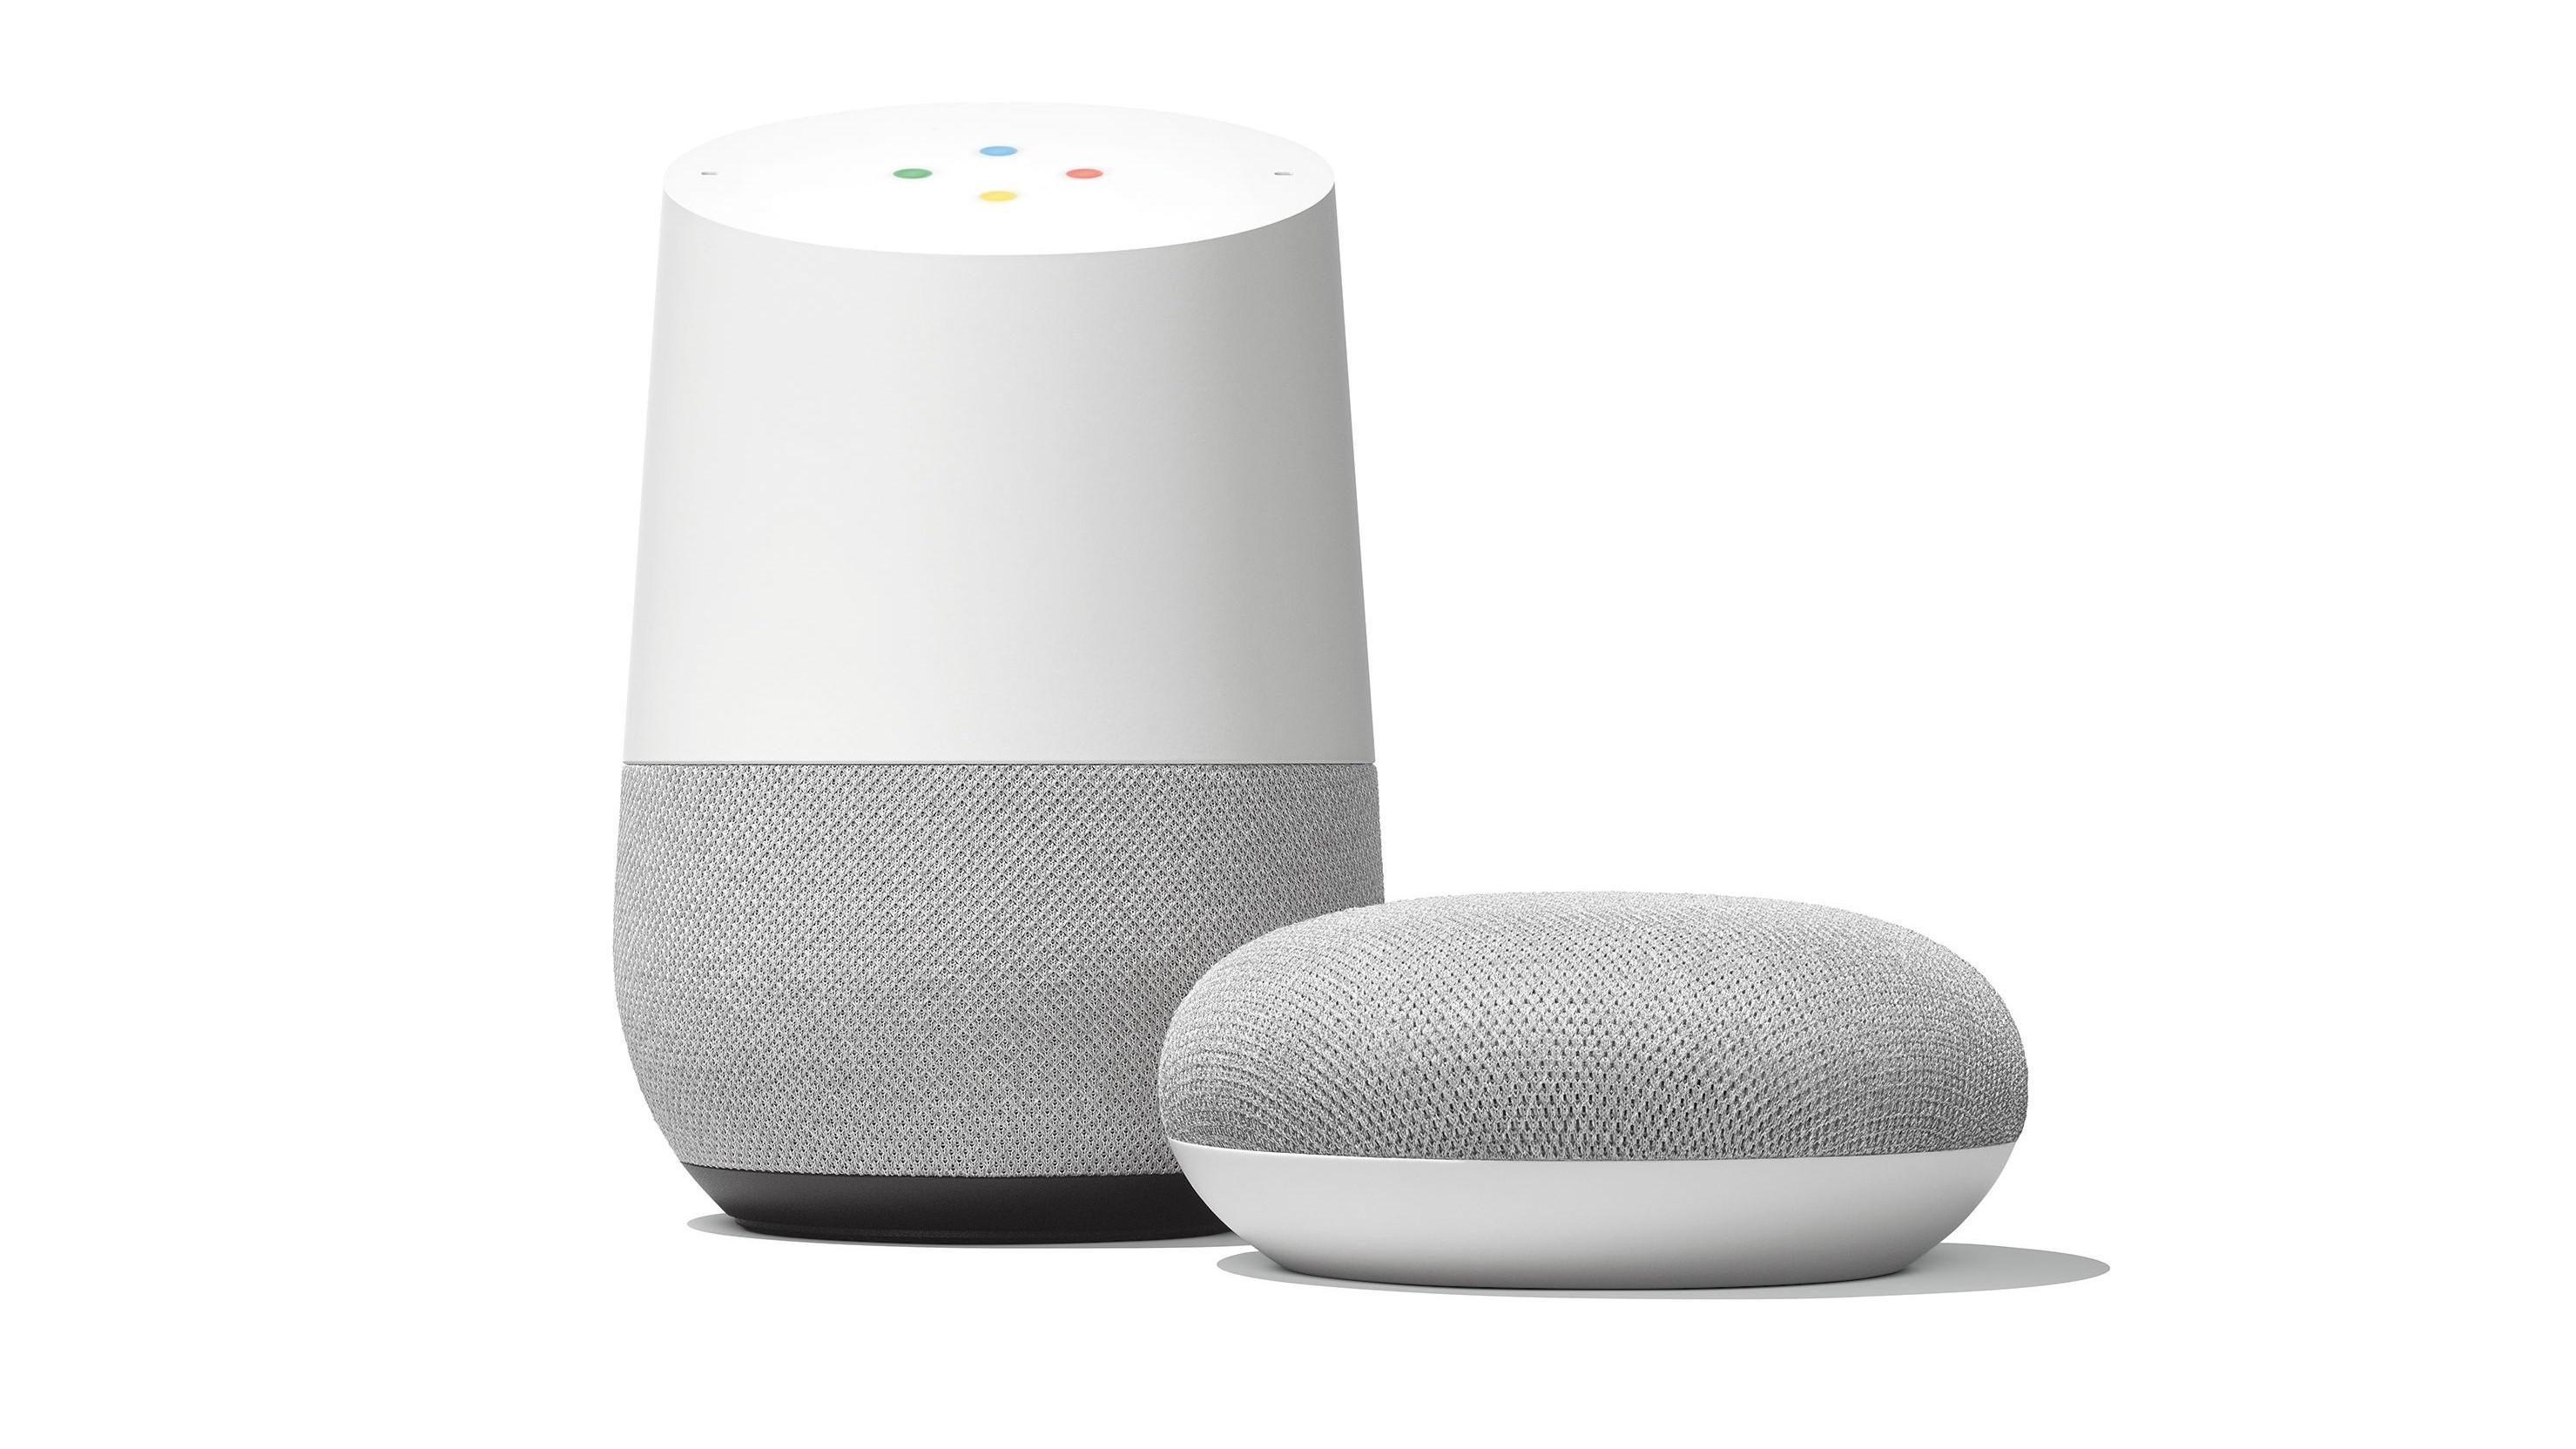 Endelig. Nå kommer Google Home til Norge.